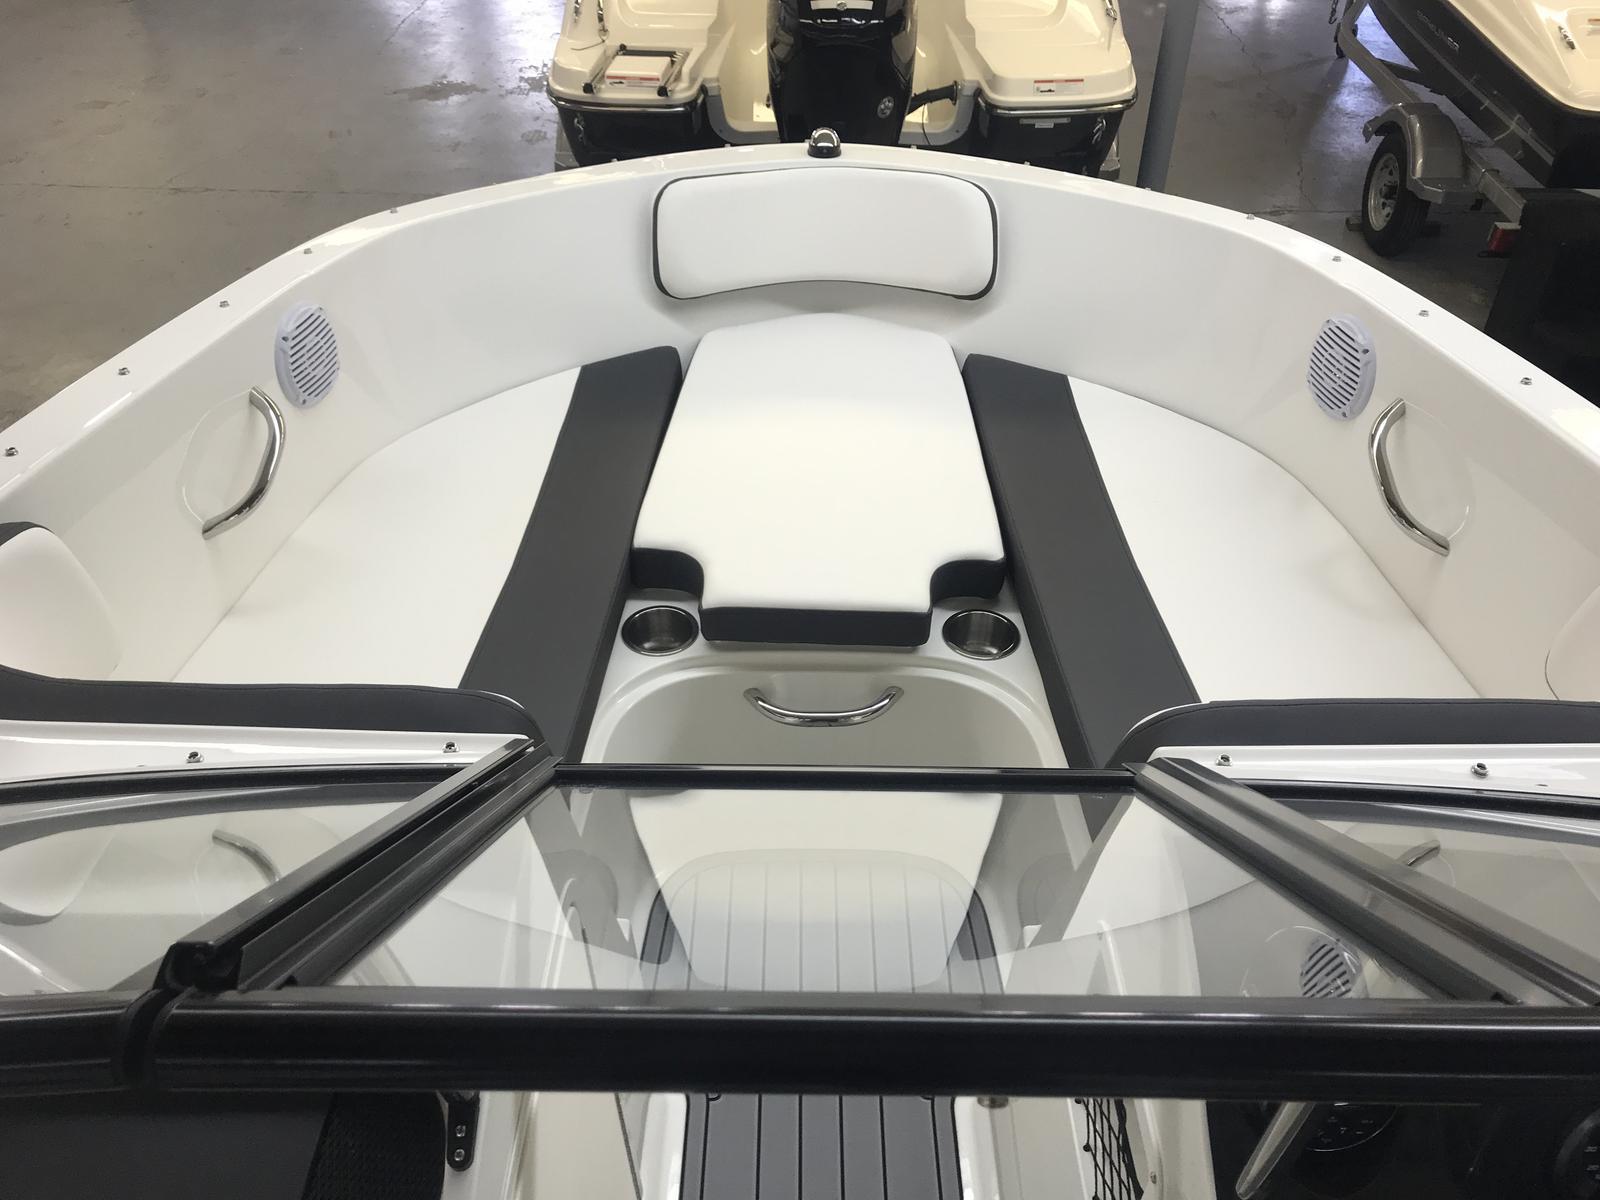 2019 Bayliner boat for sale, model of the boat is VR4 Bowrider & Image # 3 of 21